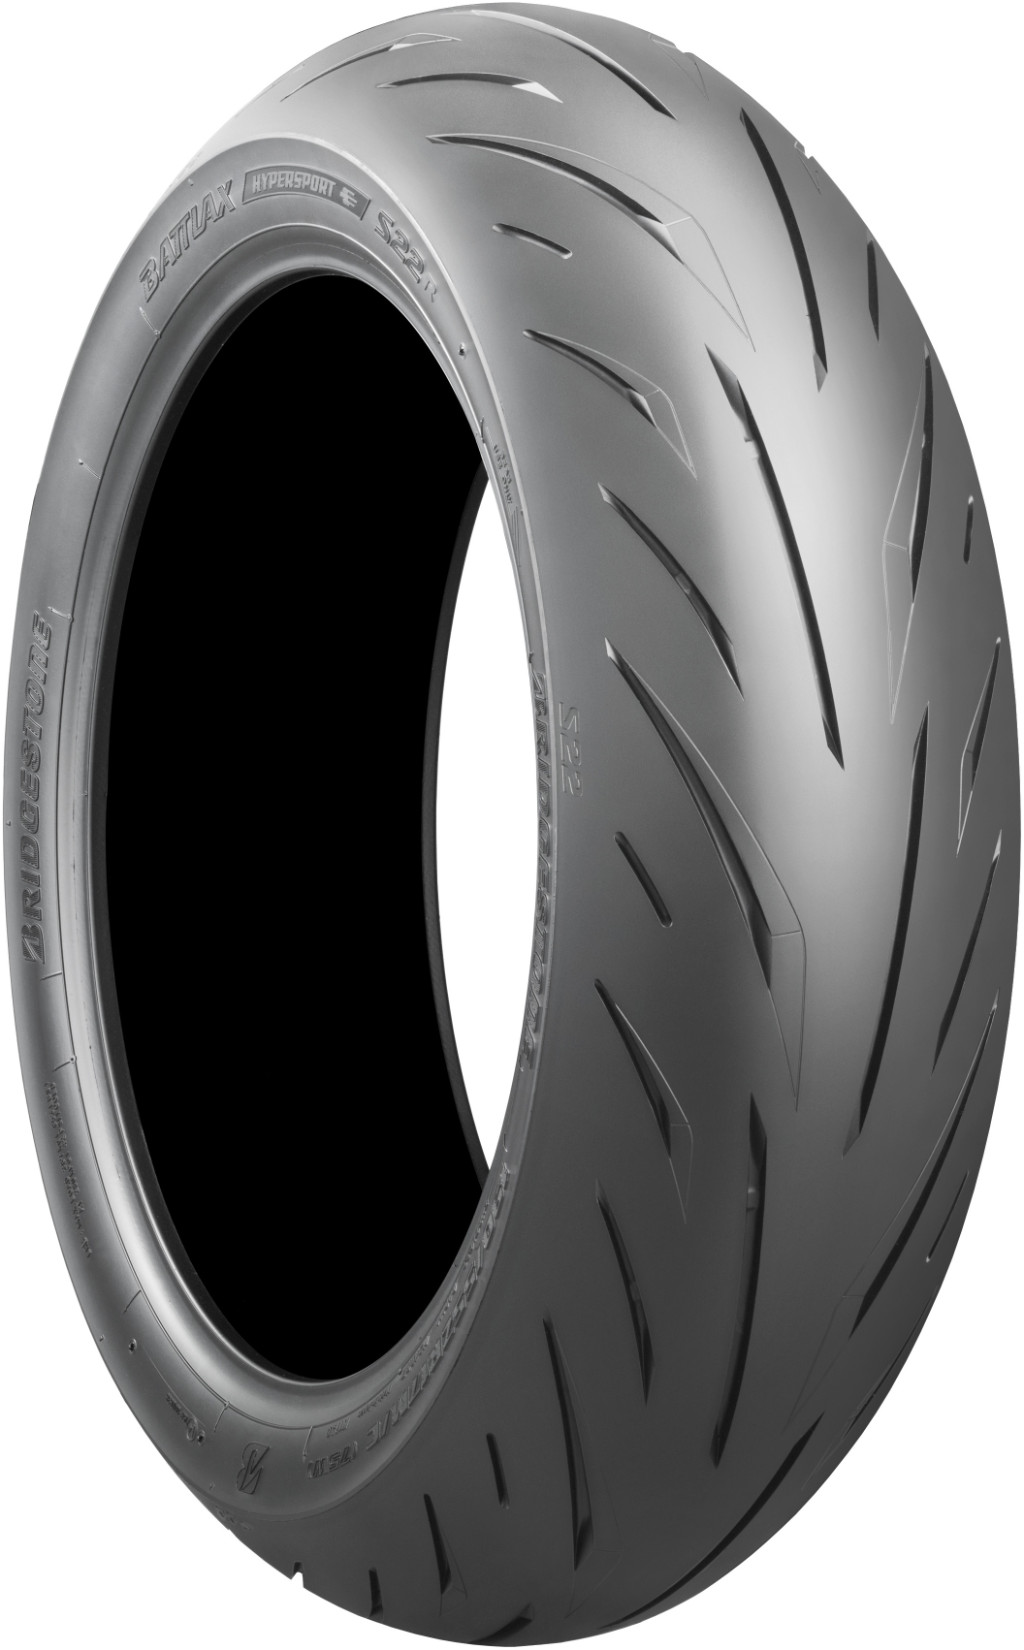 BRIDGESTONE ブリヂストンBATTLAX HYPER SPORT S22【190/55ZR17M/C(75W)】バトラックス ハイパースポーツ タイヤ